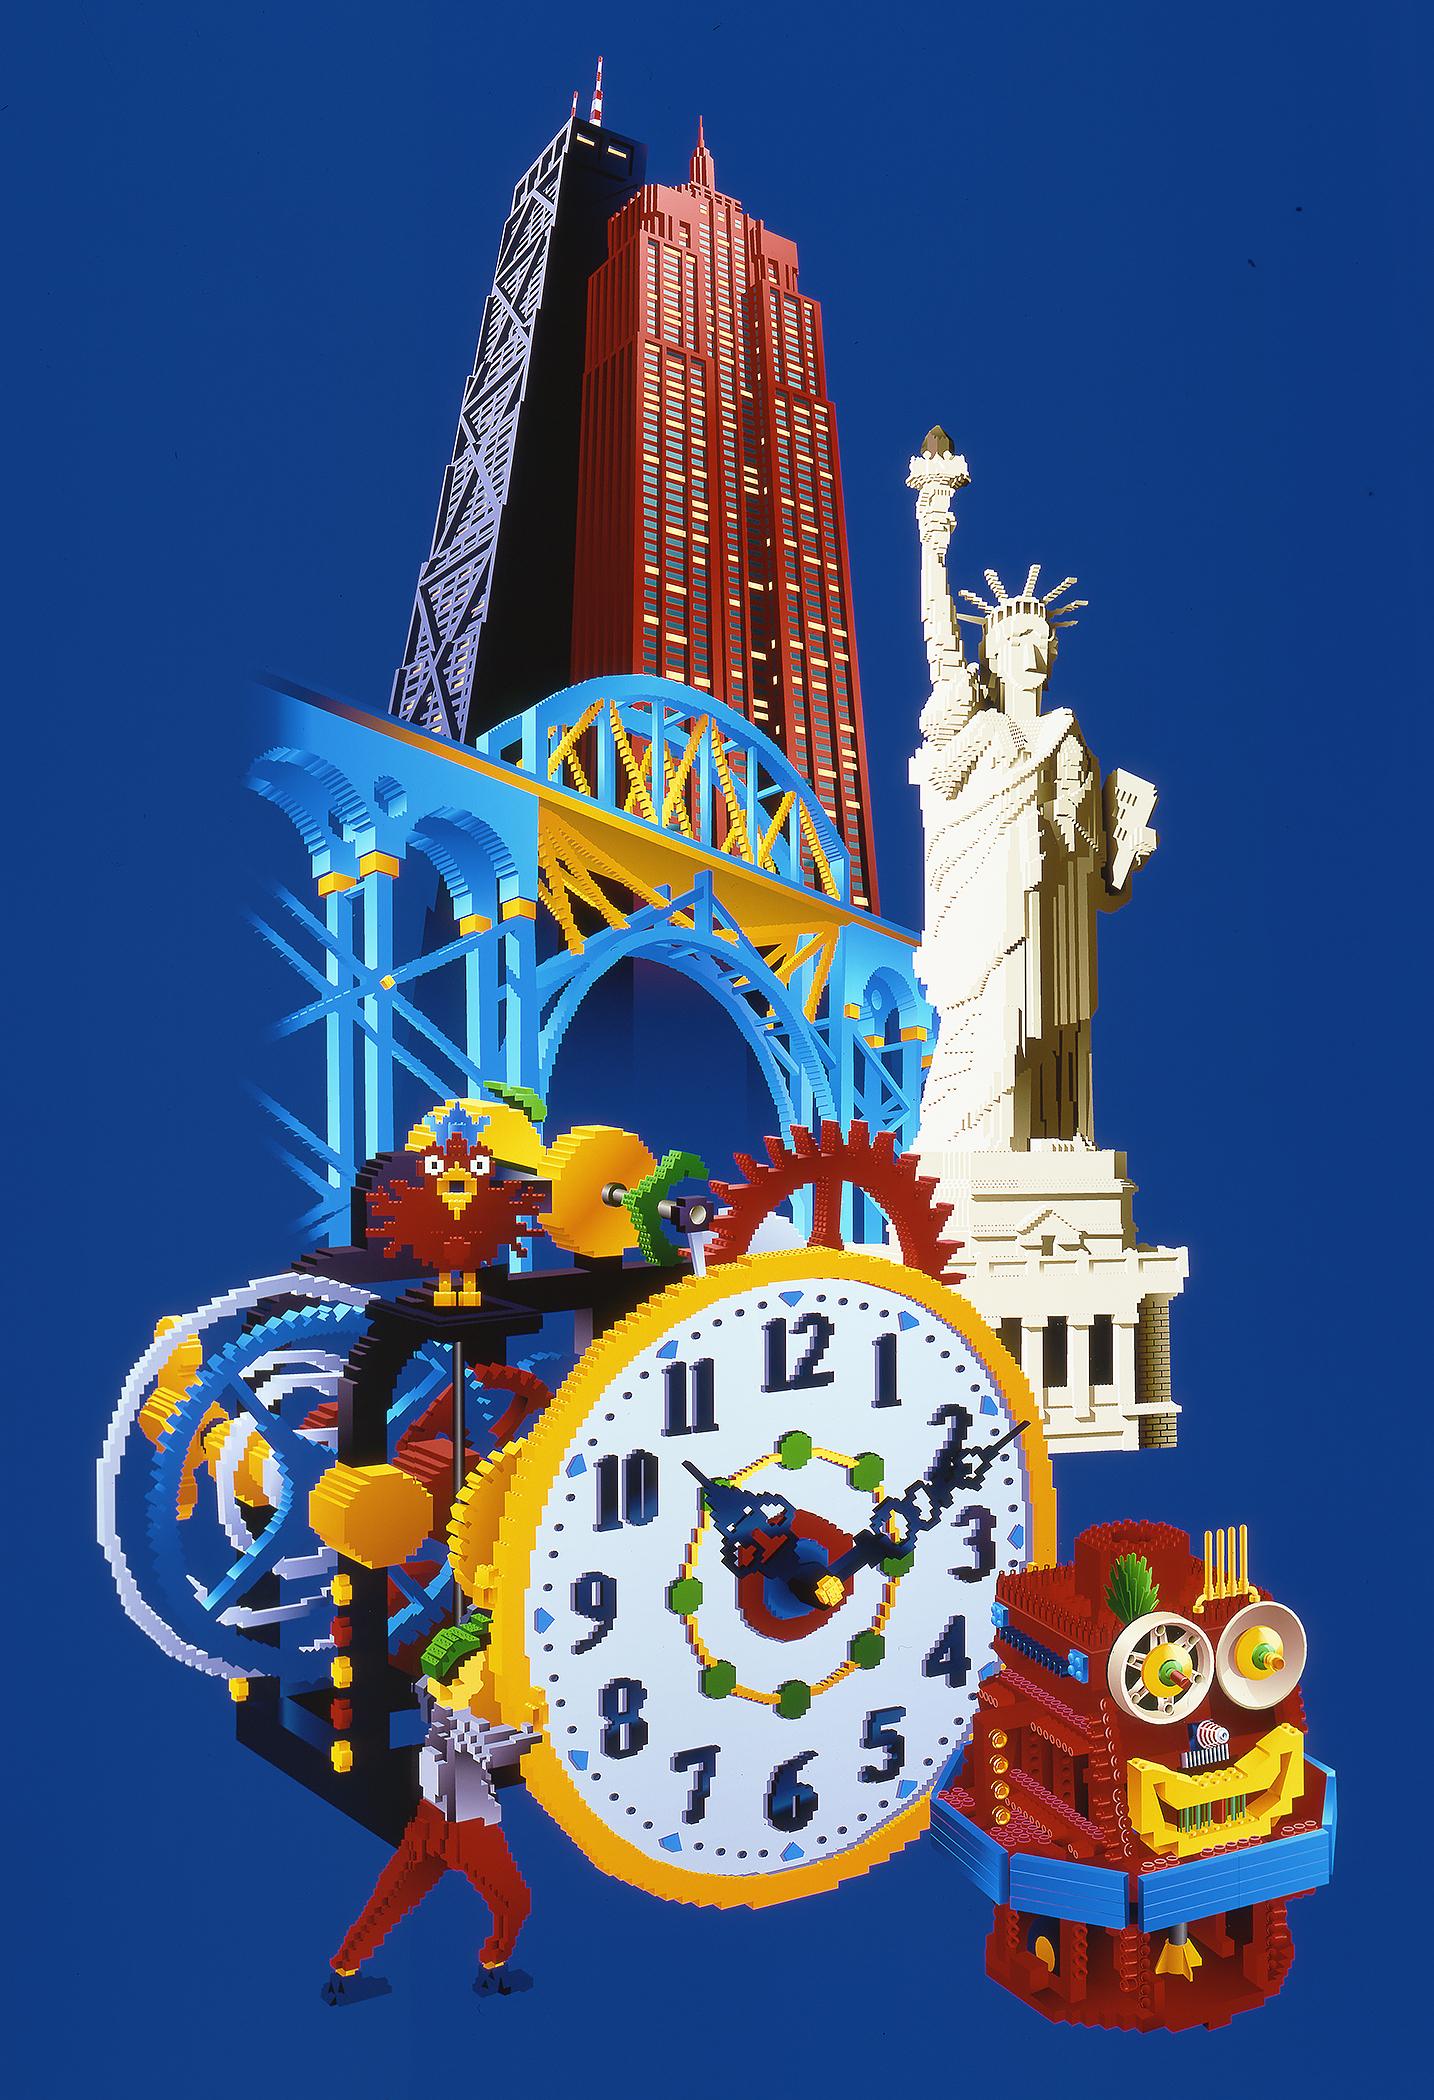 Lego Children's Museum Tour Poster